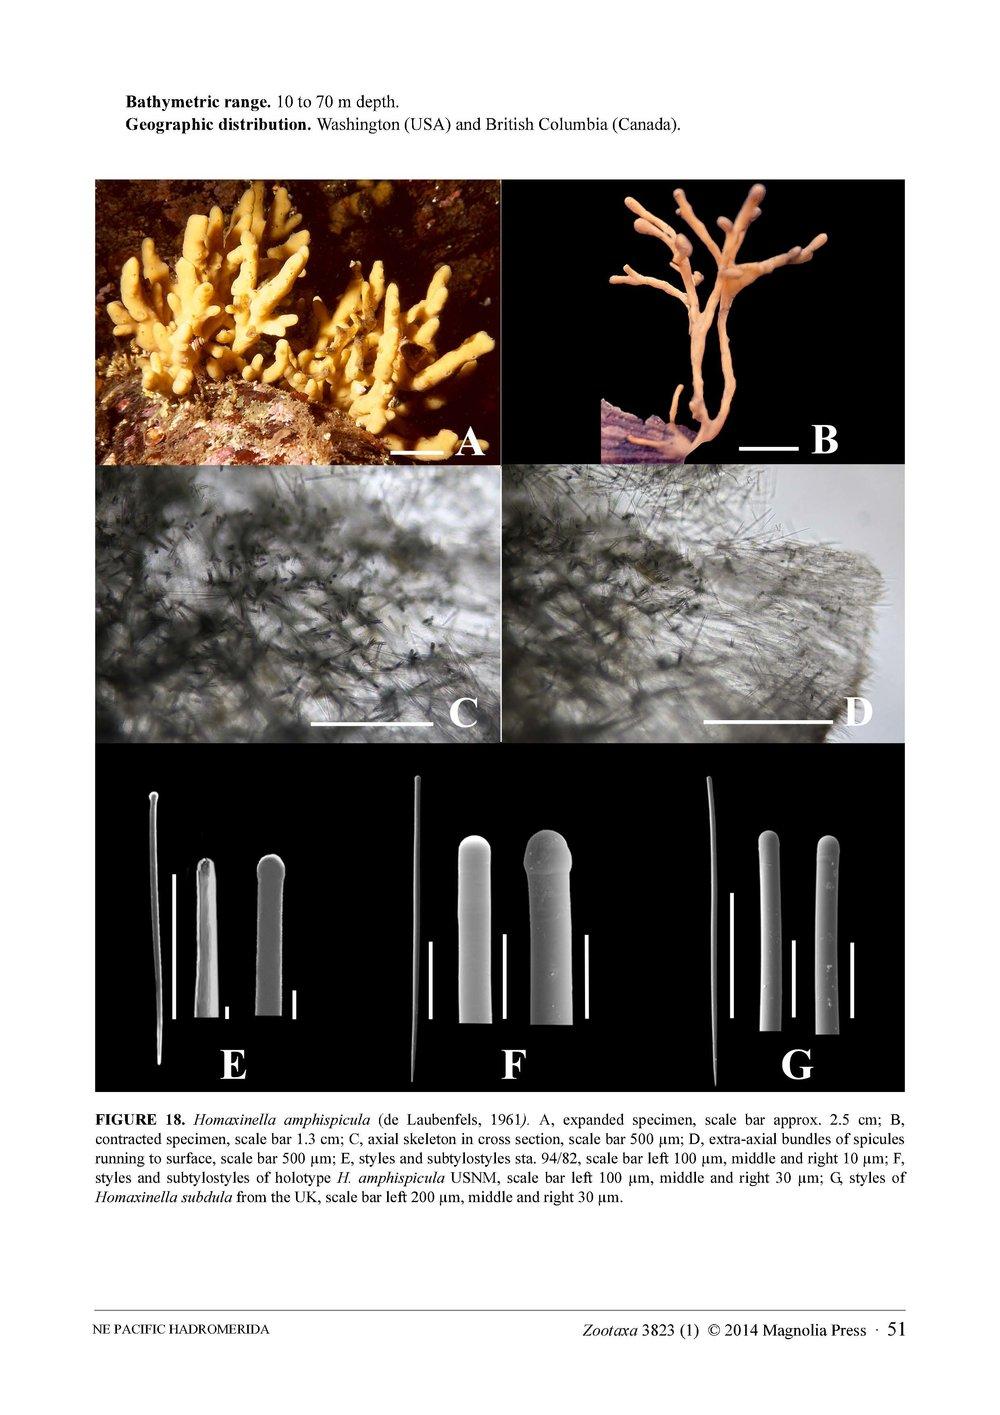 Austin et al 2014 NE Pacific Hadromerids_Page_51.jpg